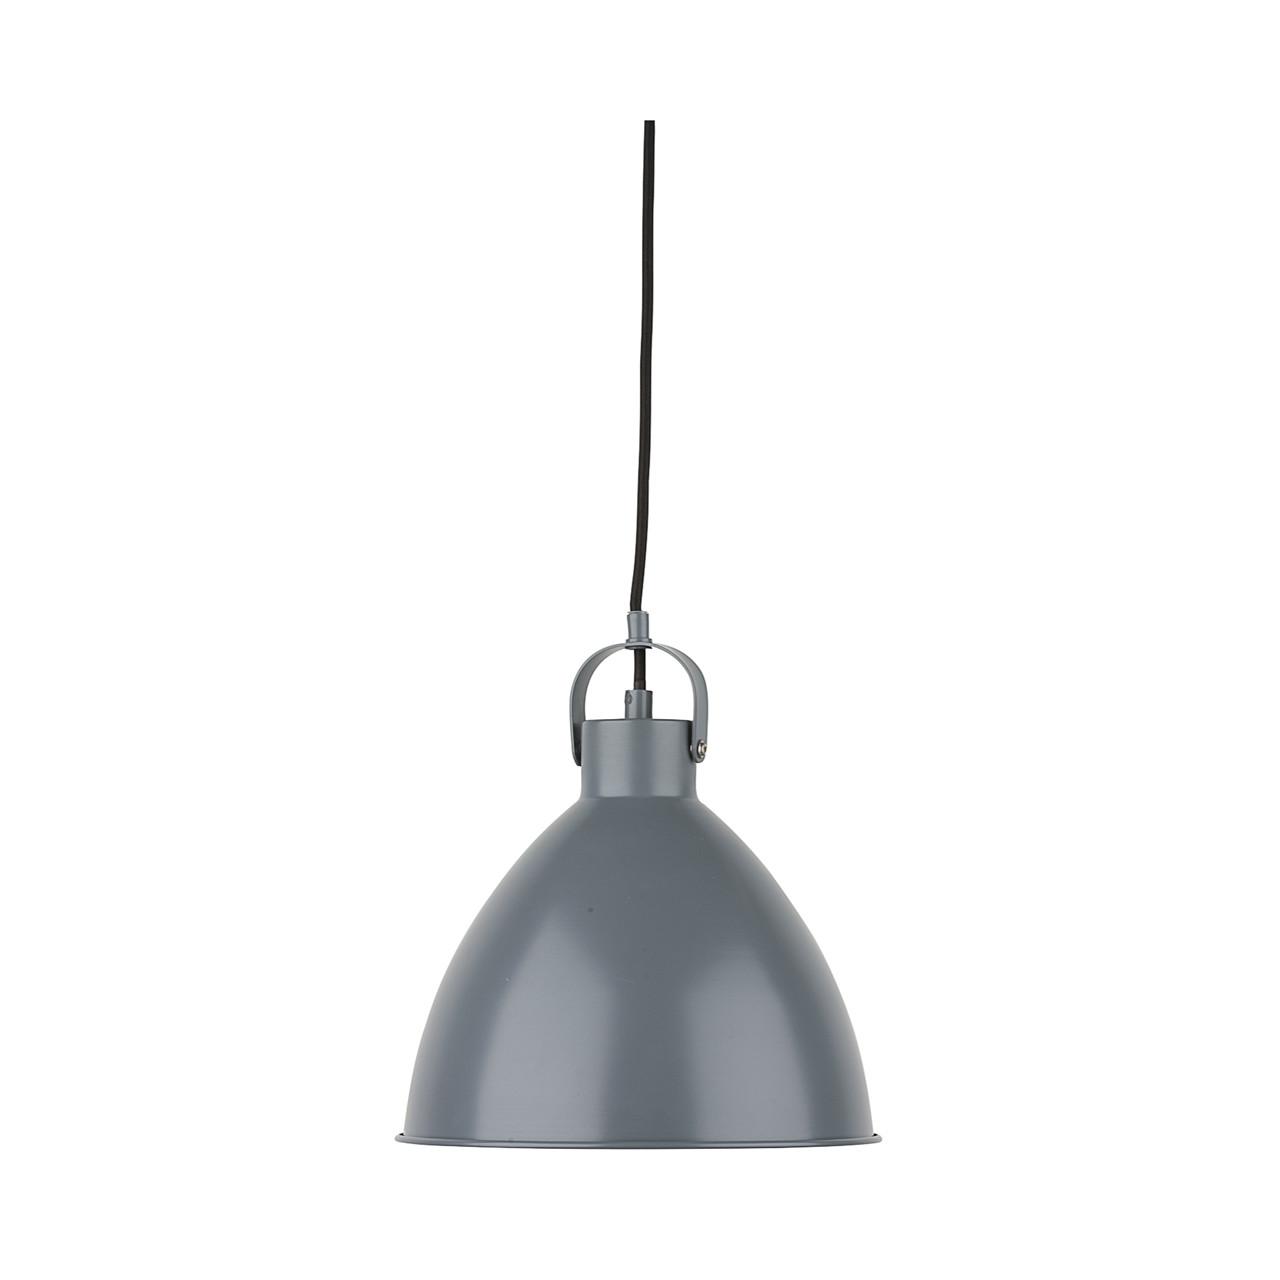 Cr ton maison mason loftlampe for Maison mason